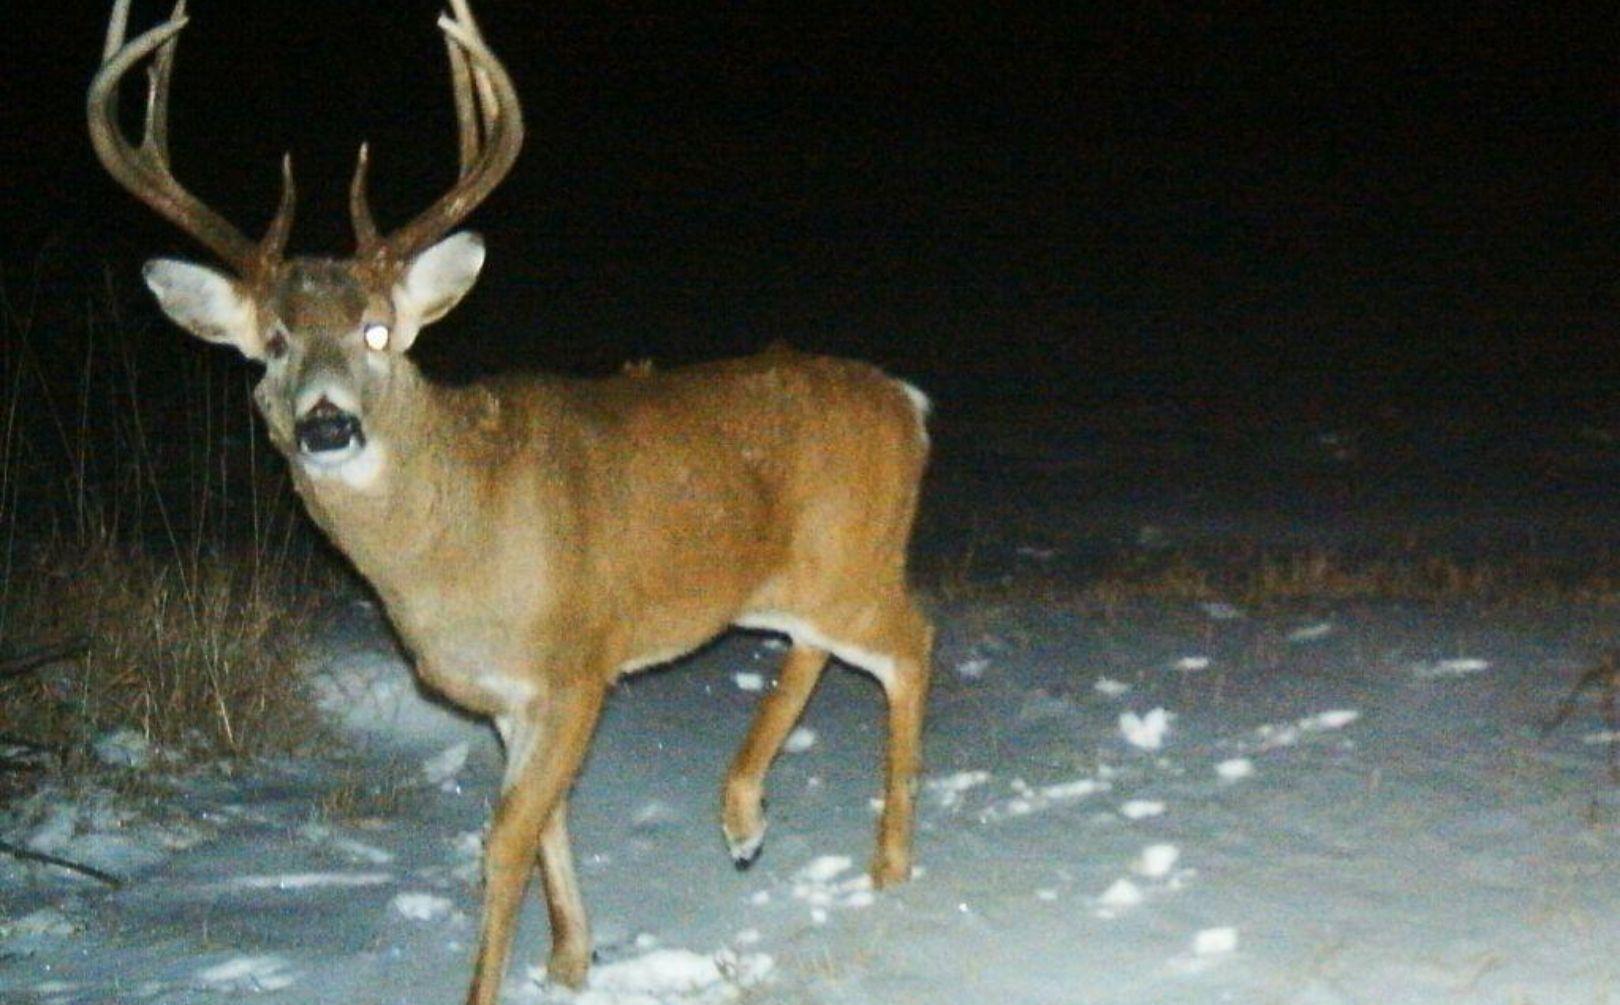 2015 Rut Prediction: Weekend Rut Timing | Whitetail Habitat regarding Deer Rut Schedule